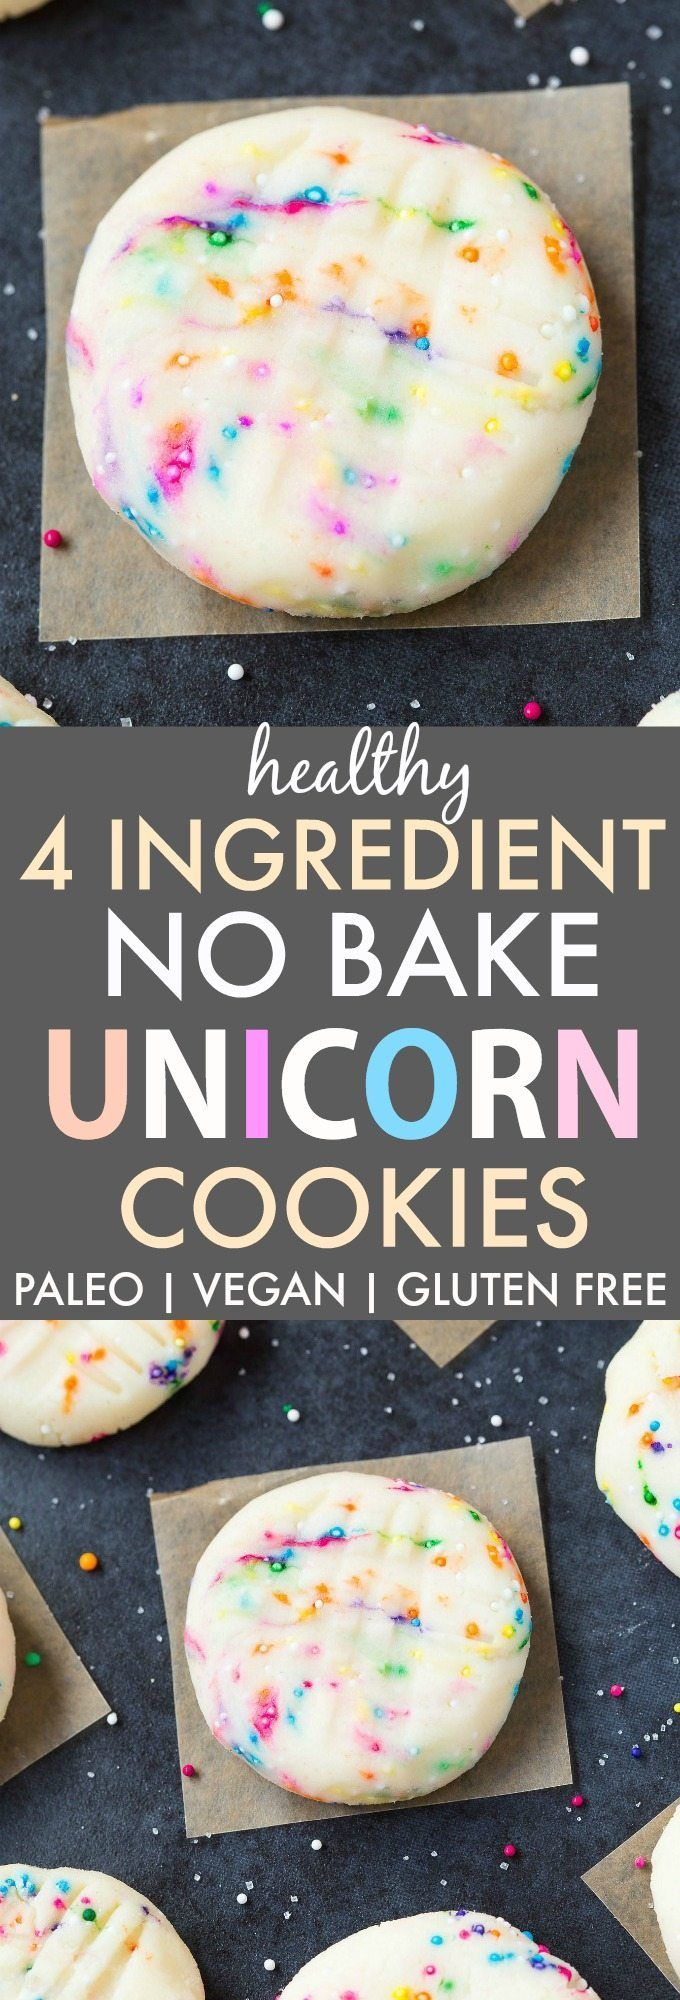 Healthy No Bake Unicorn Cookies (Paleo, Vegan, Gluten Free)